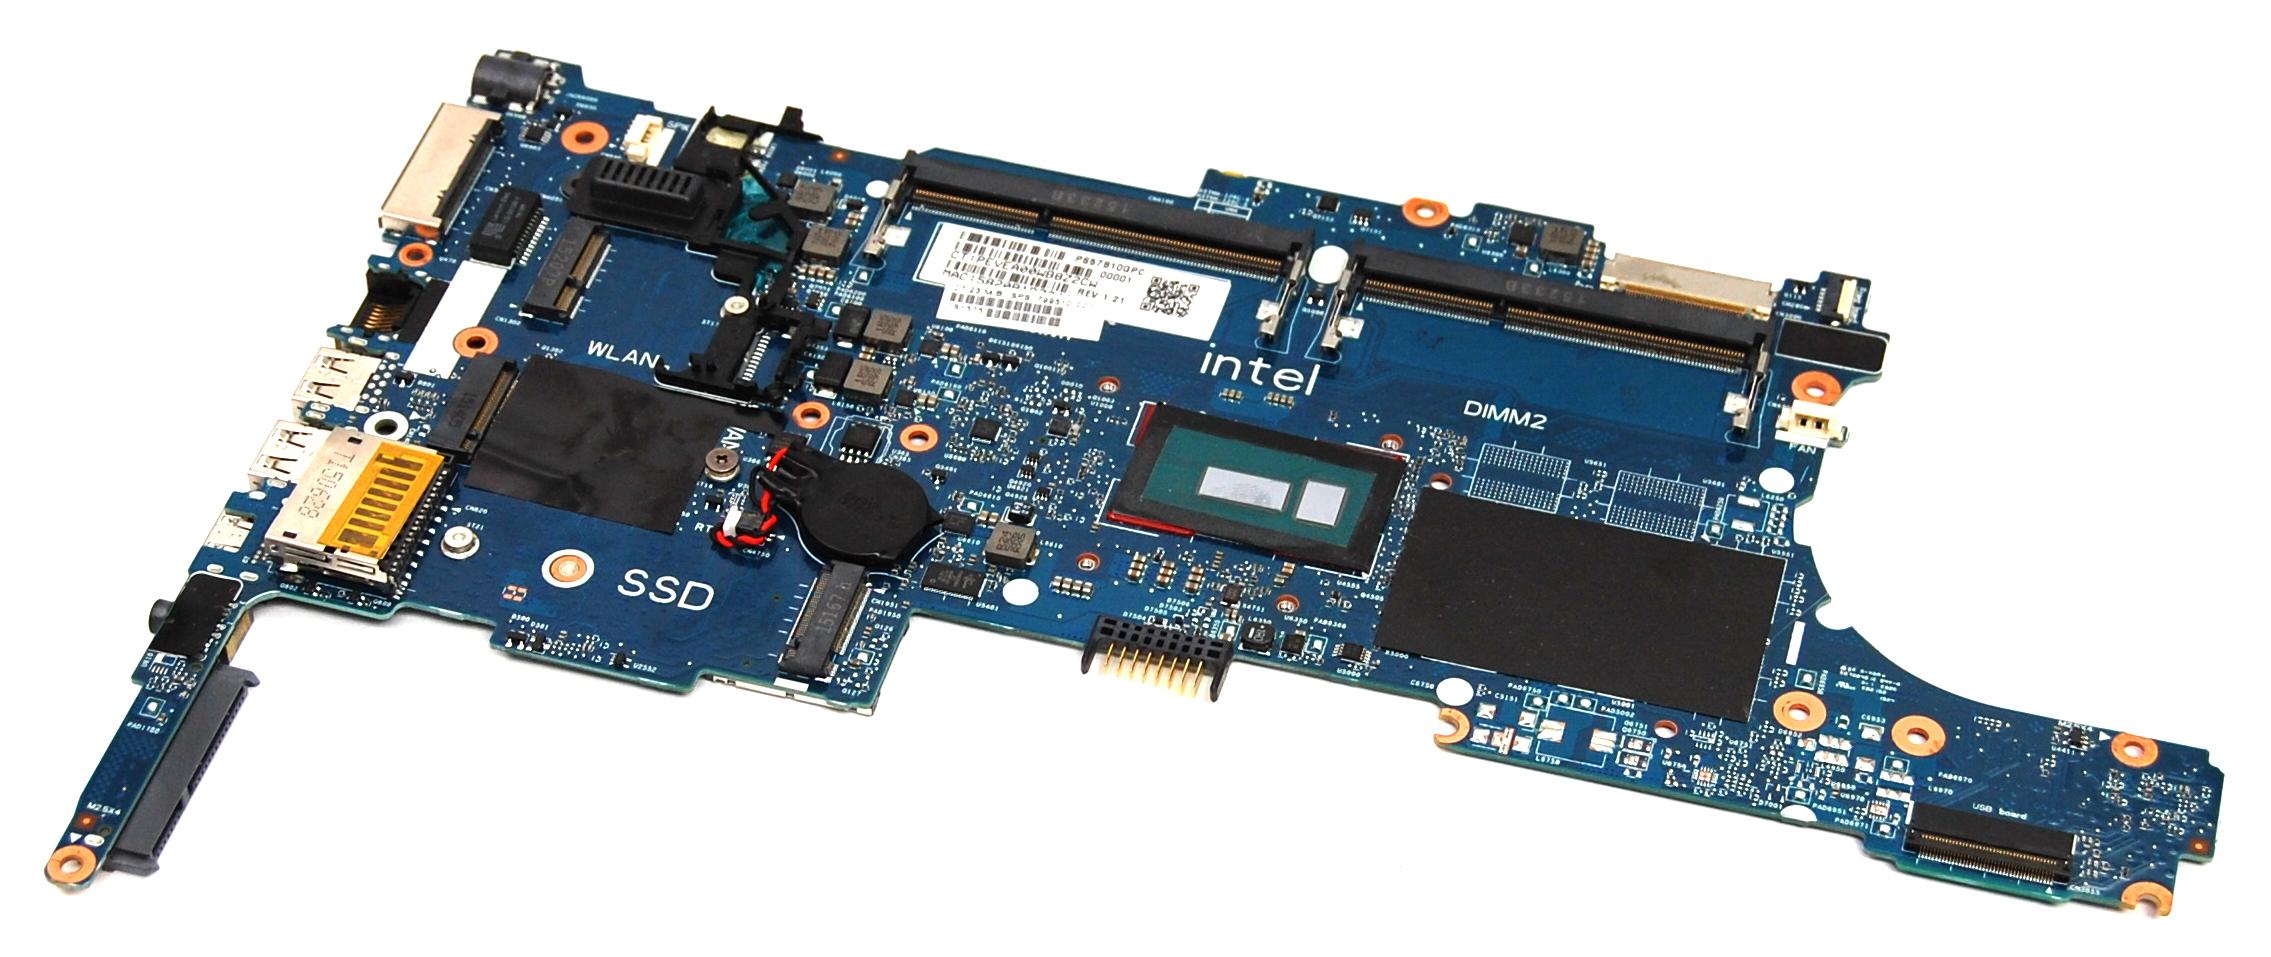 HP 799510-601 Elitebook 840 G2 with Intel i5-5200u Laptop Motherboard